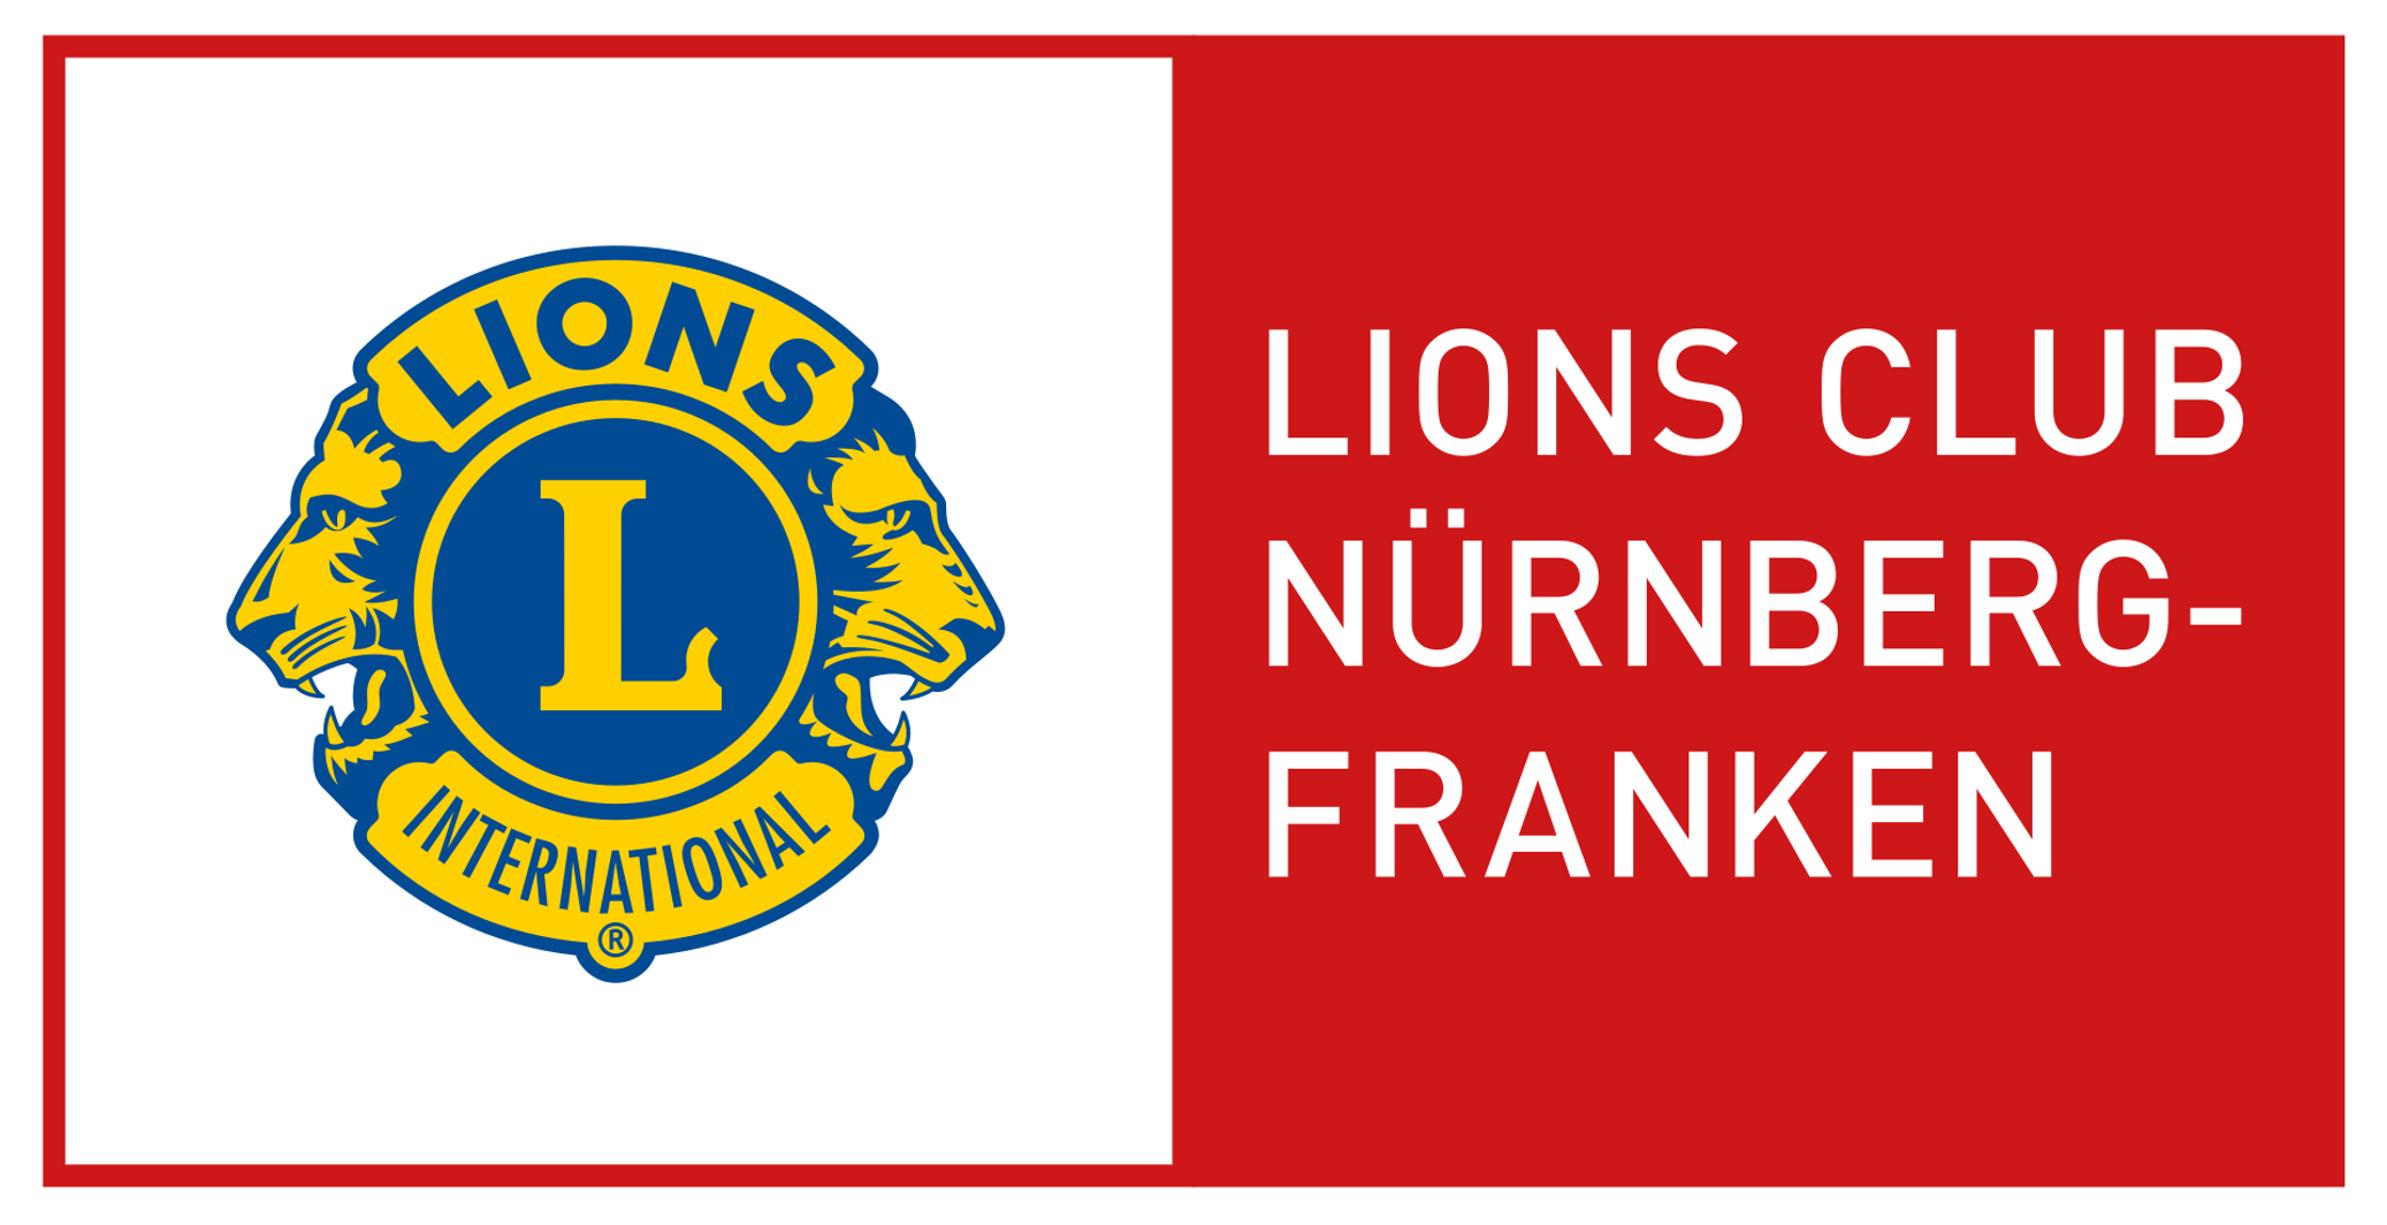 Lions Club Nürnberg-Franken Logo